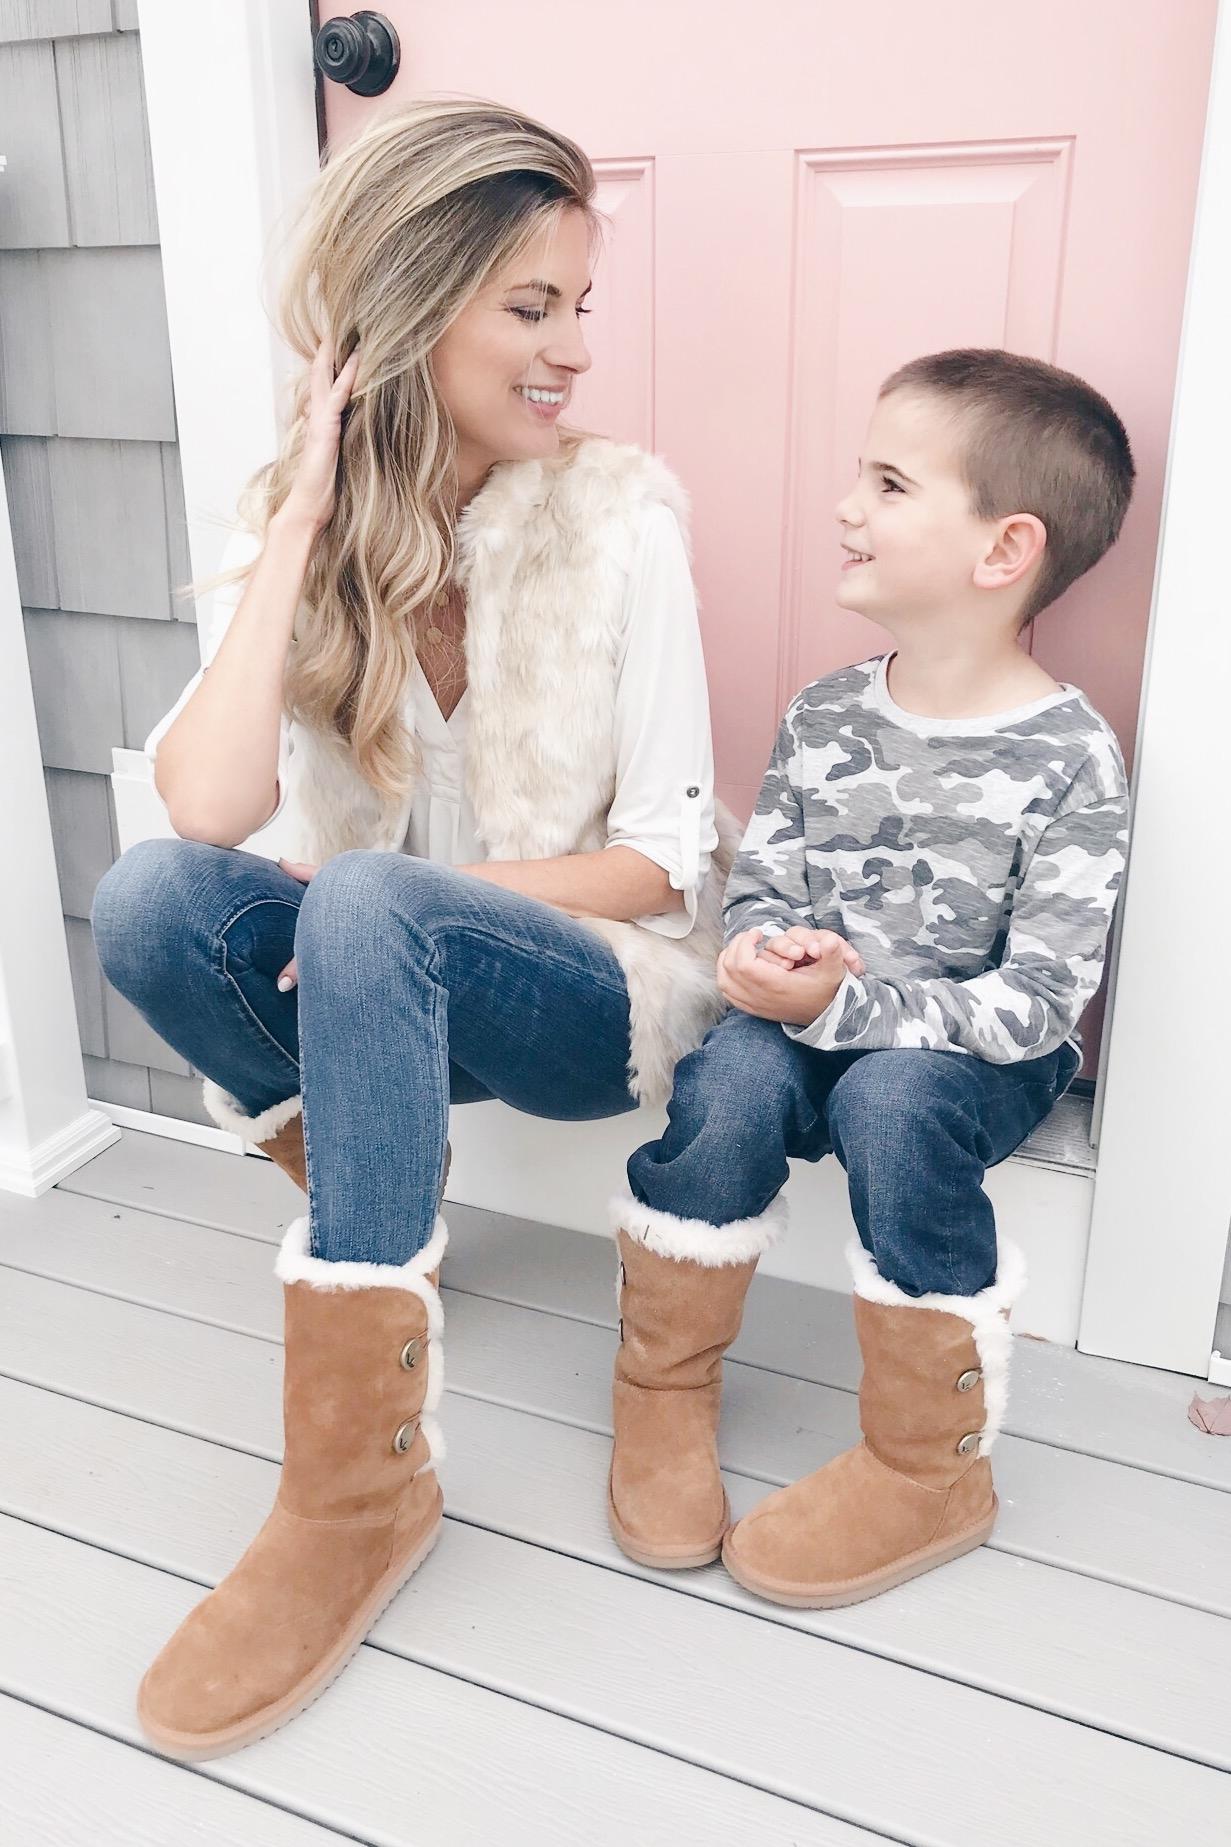 koolaburra boots on mother and son - pinteresting plans fashion blog